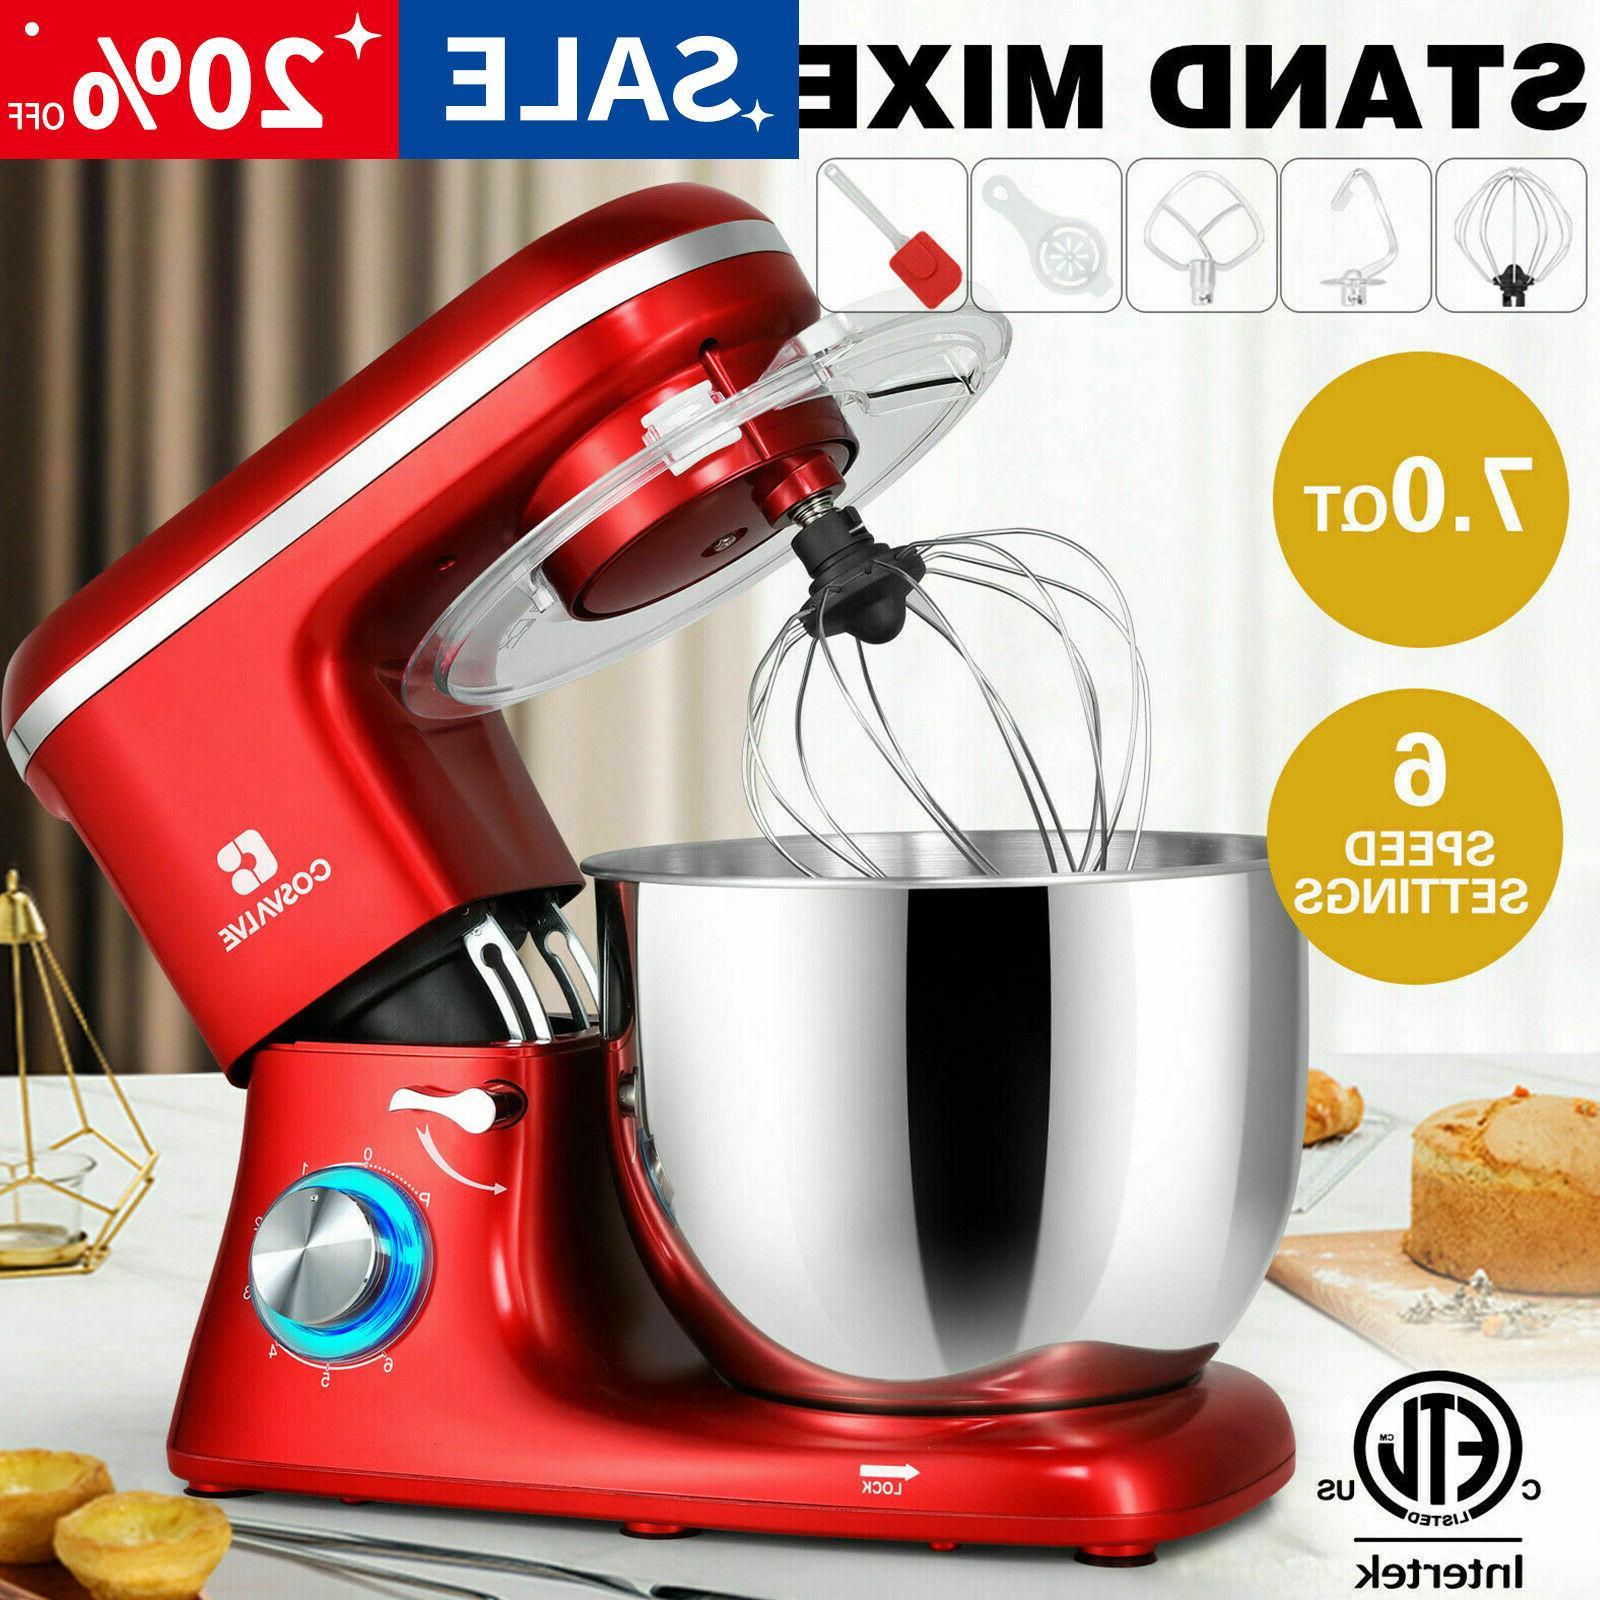 pro electric food stand mixer 7 qt